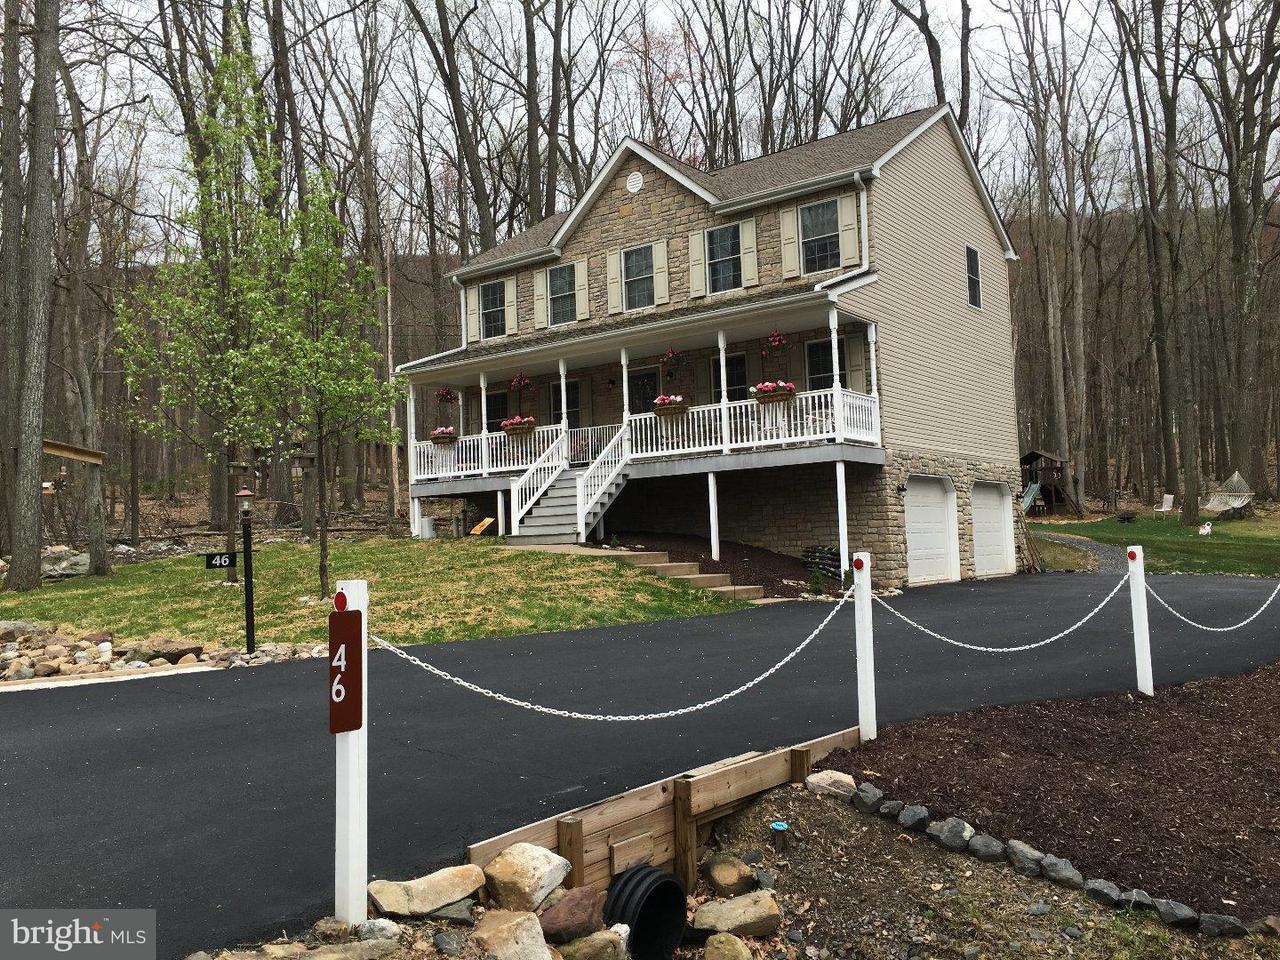 Single Family Home for Sale at 46 E TUSCARORA Drive Hazle Township, Pennsylvania 18202 United States